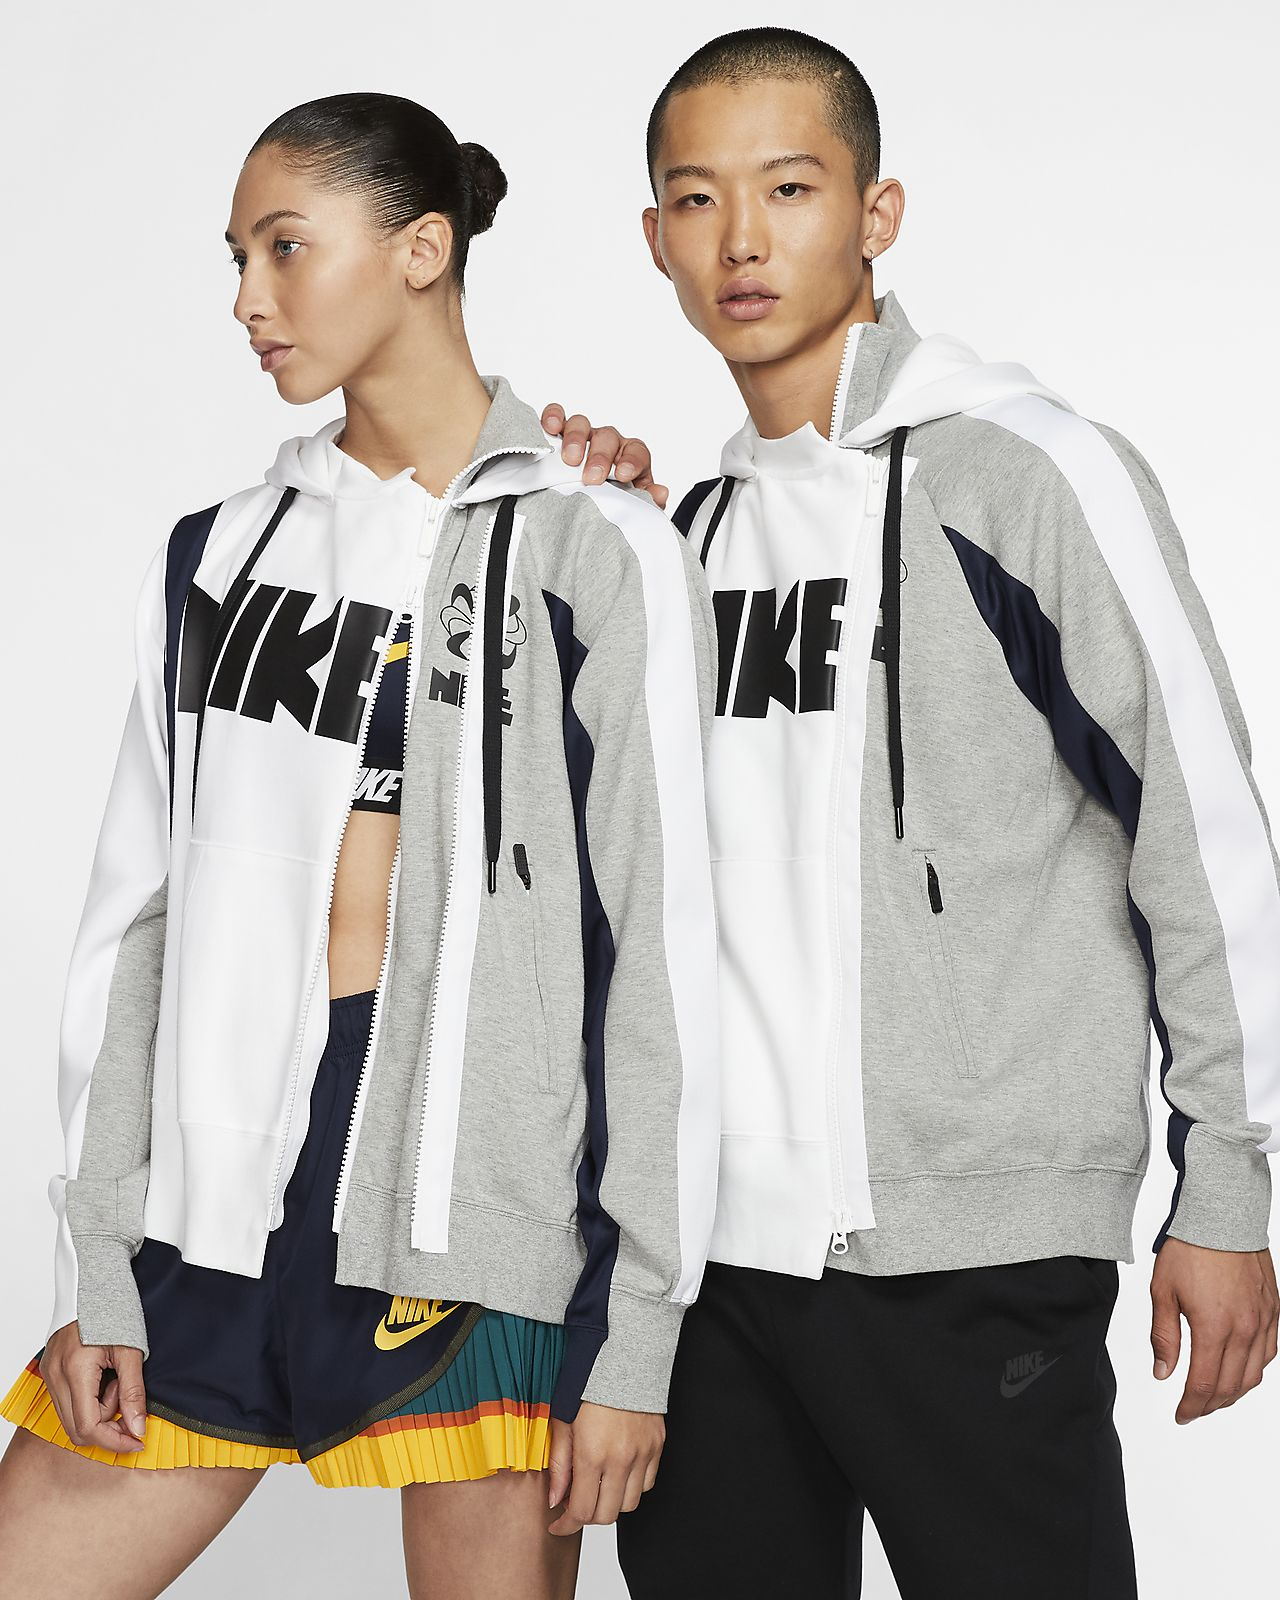 Nike x Sacai Sudadera con capucha y cremallera doble